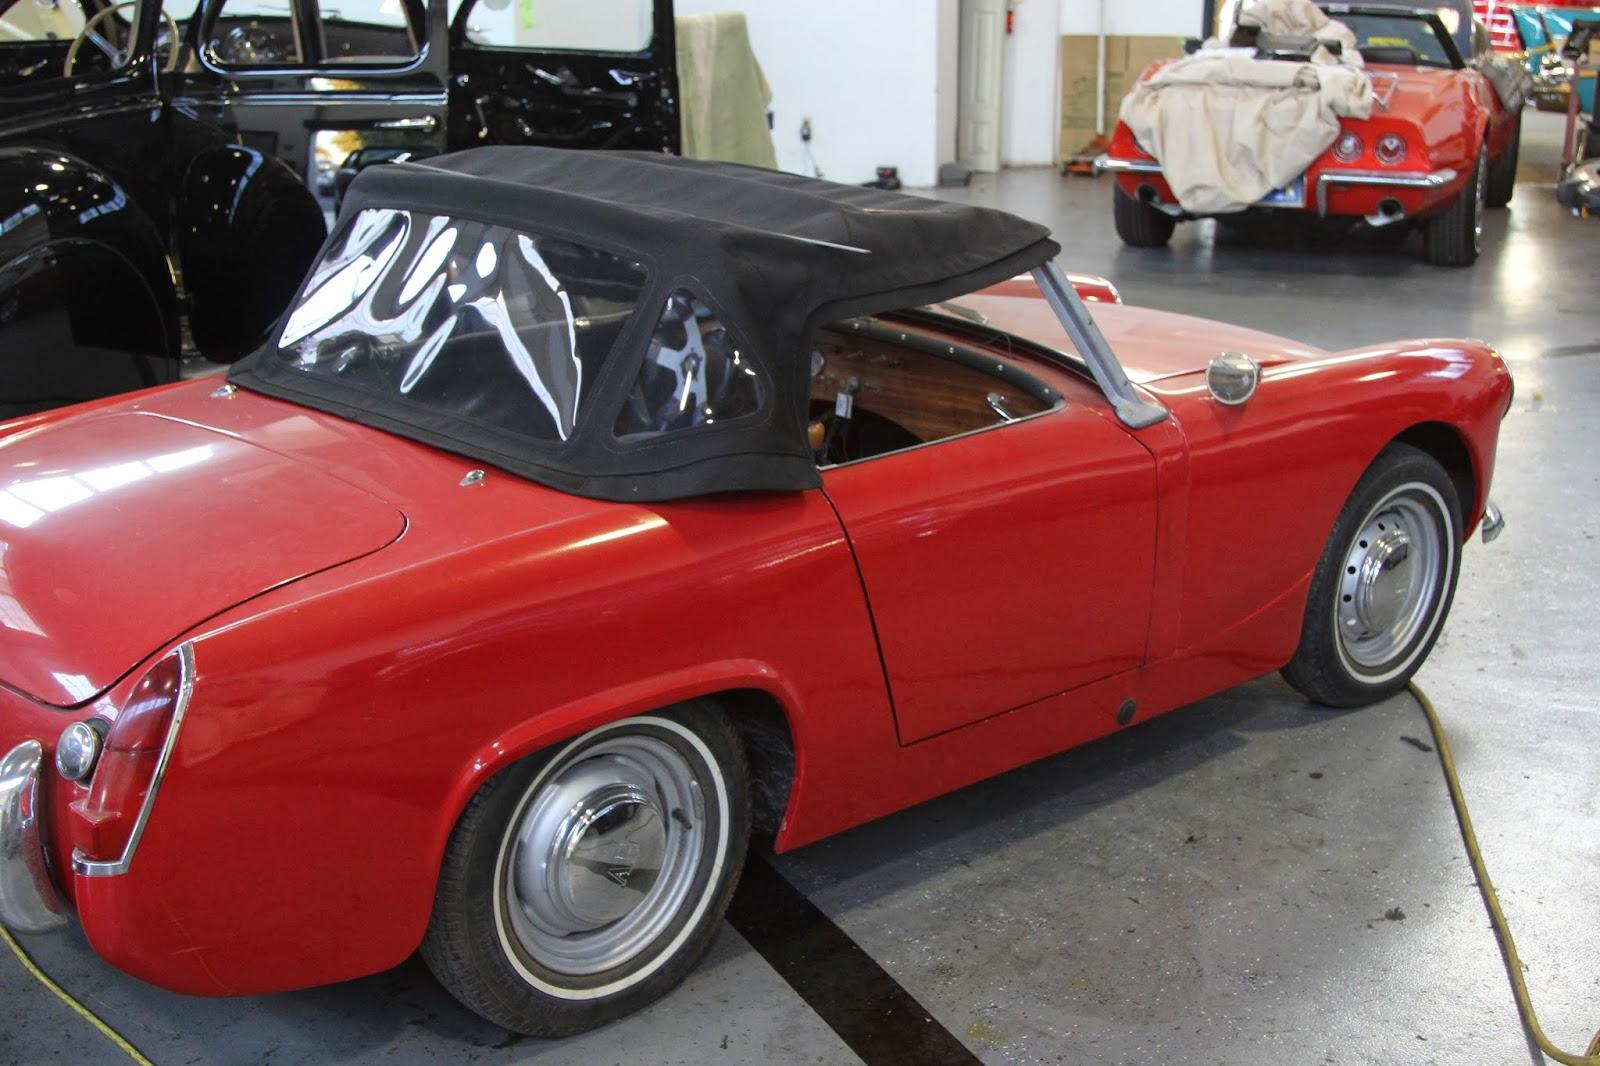 trunk lid grand new avanza all kijang innova vs crv cooks upholstery and classic restoration auto convertible